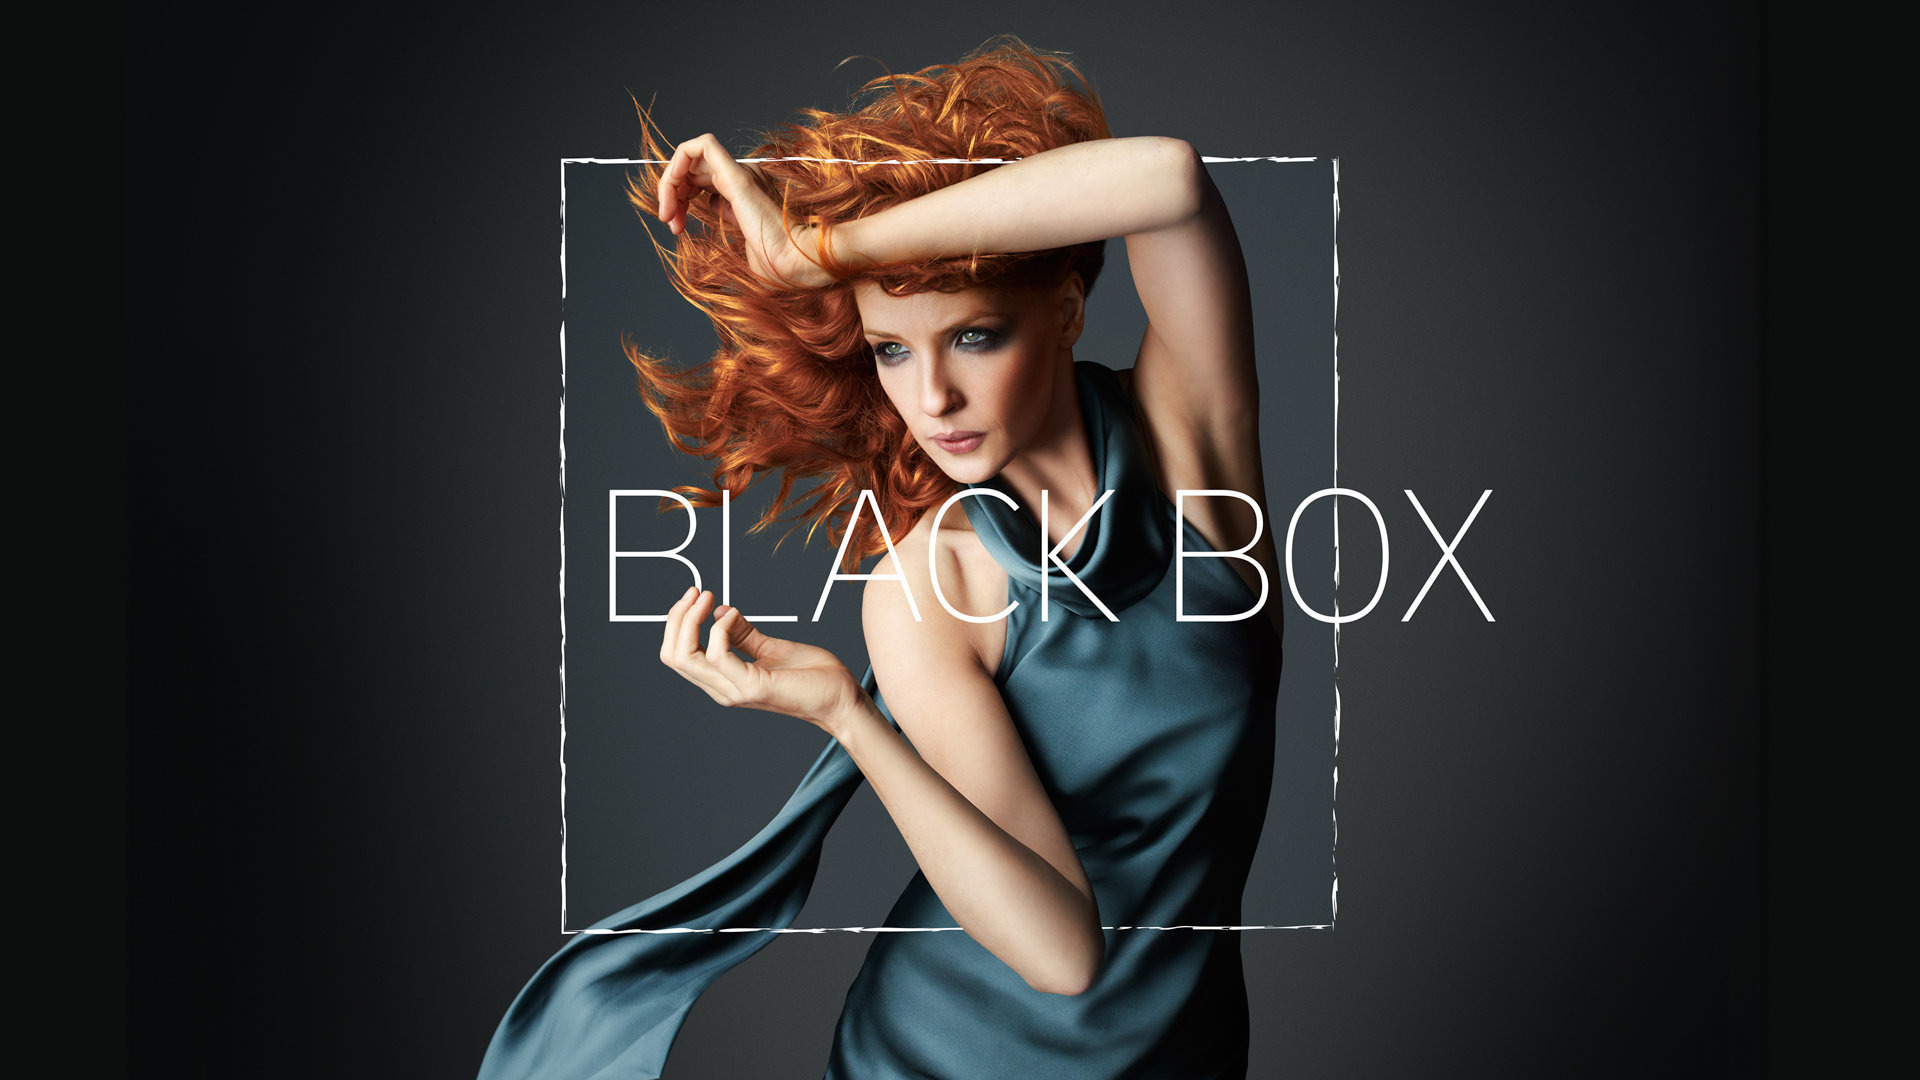 Show Black Box (ABC)